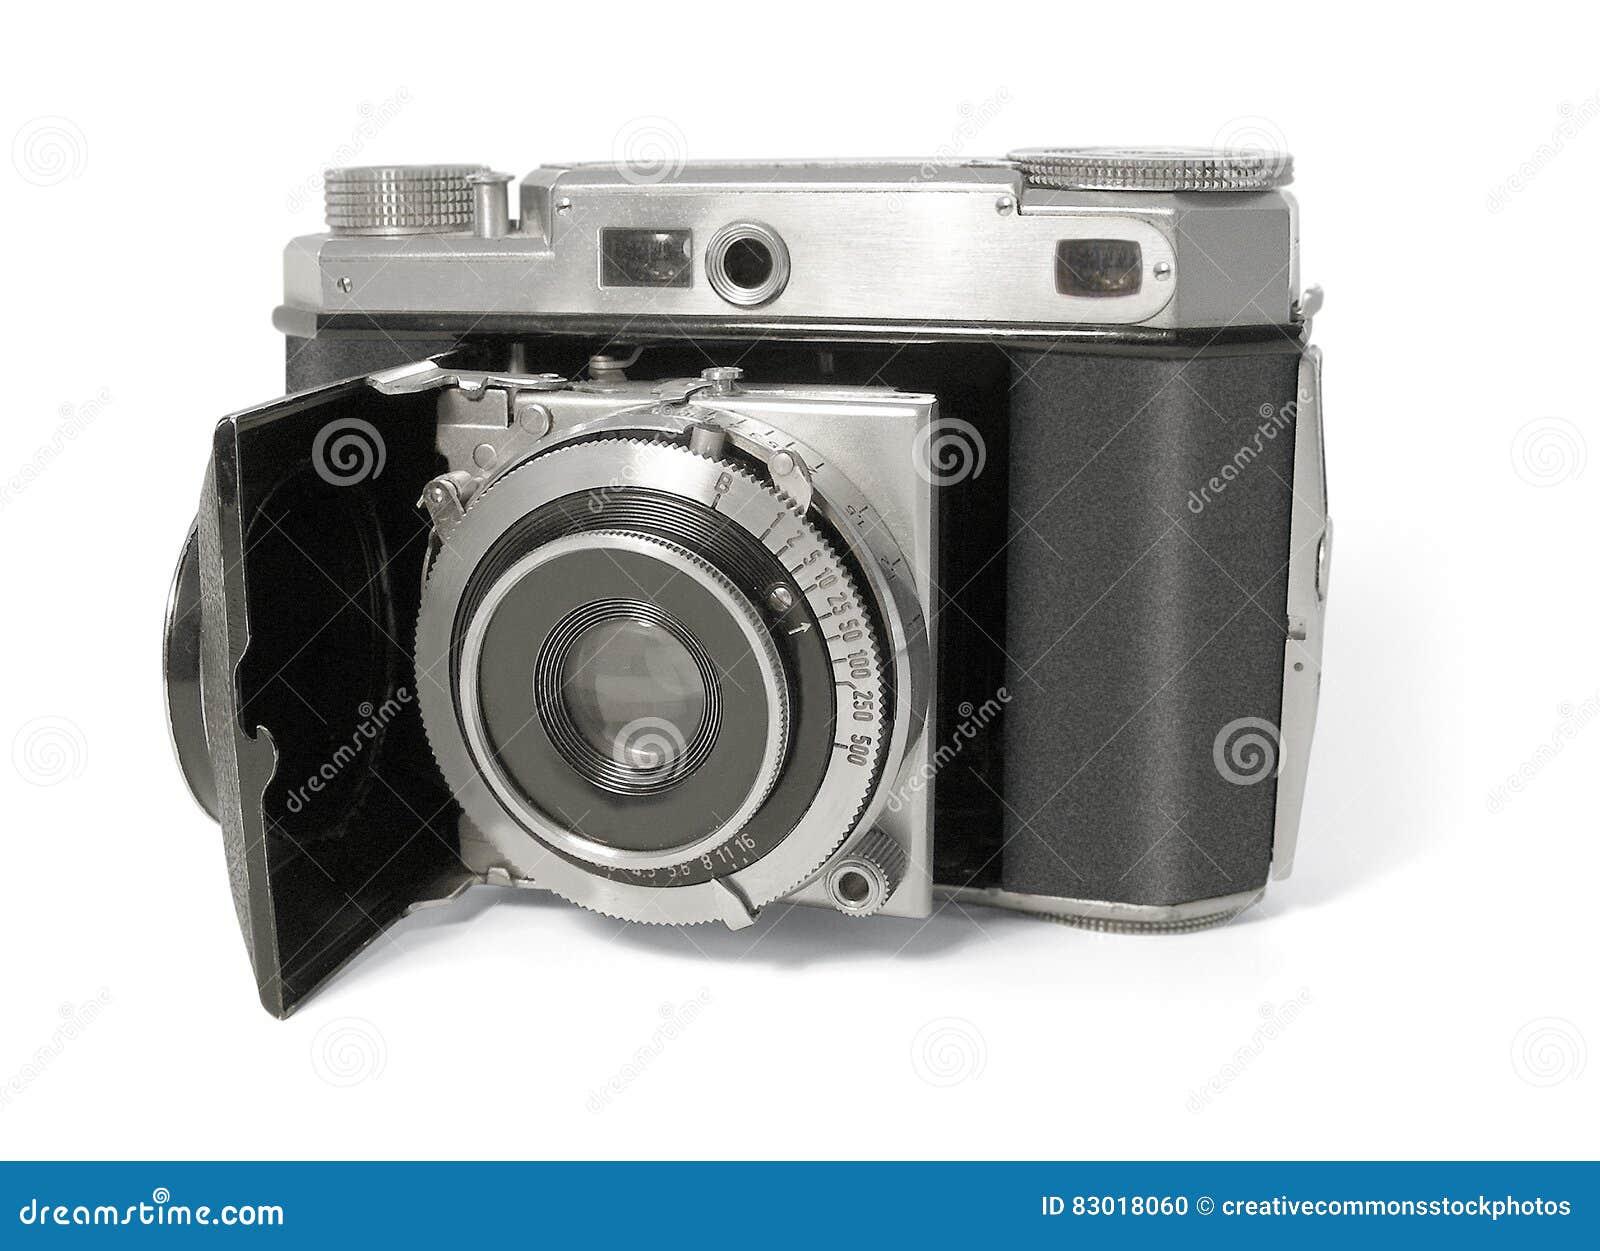 Download Black And Silver Mirrorless Camera Stock Photo - Image of analog, photo: 83018060